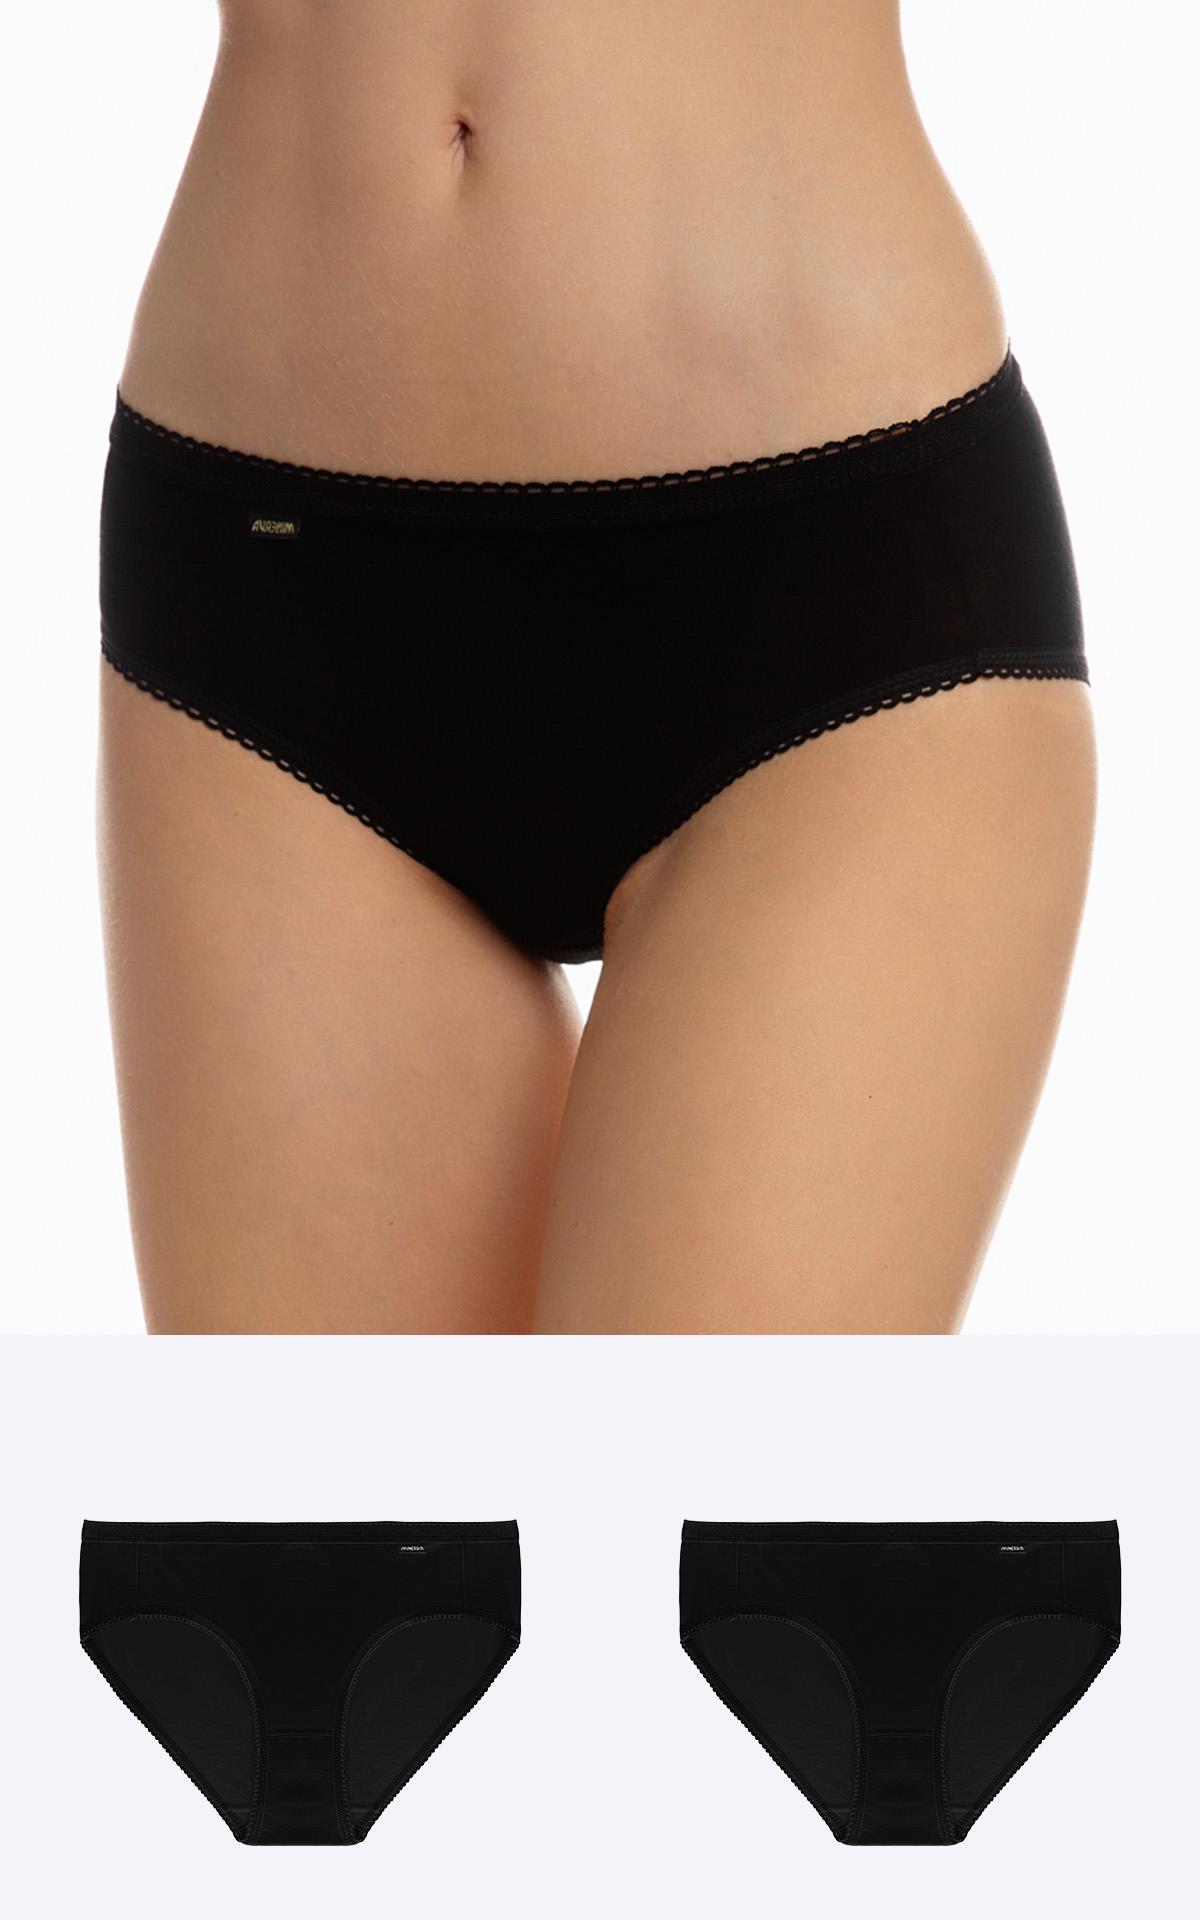 900f42e7665 Γυναίκα Εσώρουχα Everyday Slip Slip Cotton - Lycra Mini 2 τεμάχια